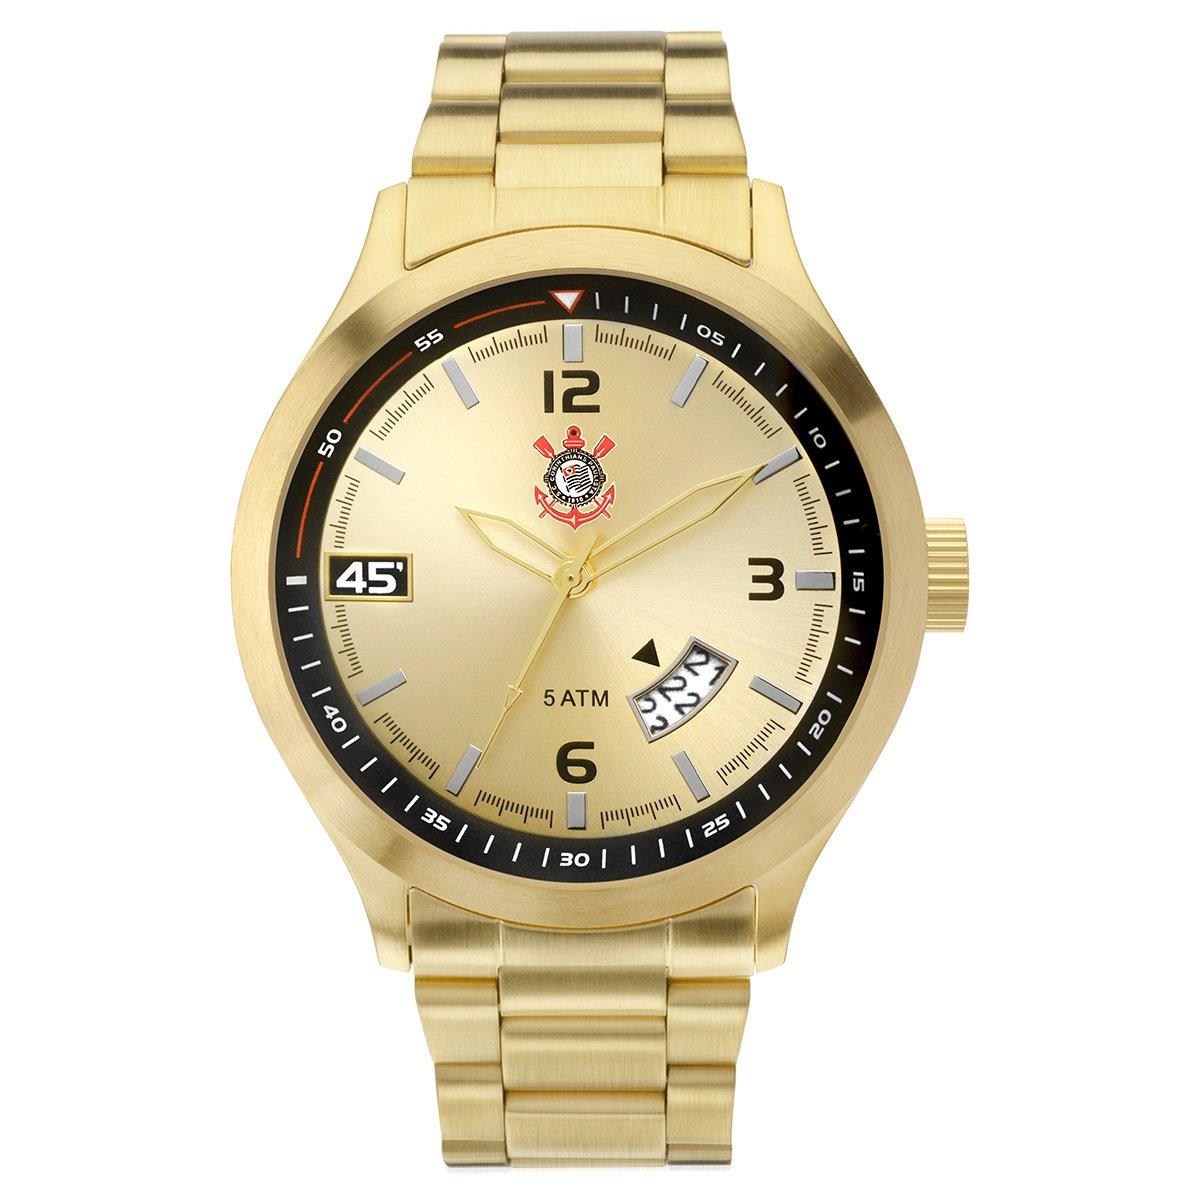 7729b200e44 Relógio Corinthians Technos Analógico Masculino - Compre Agora ...